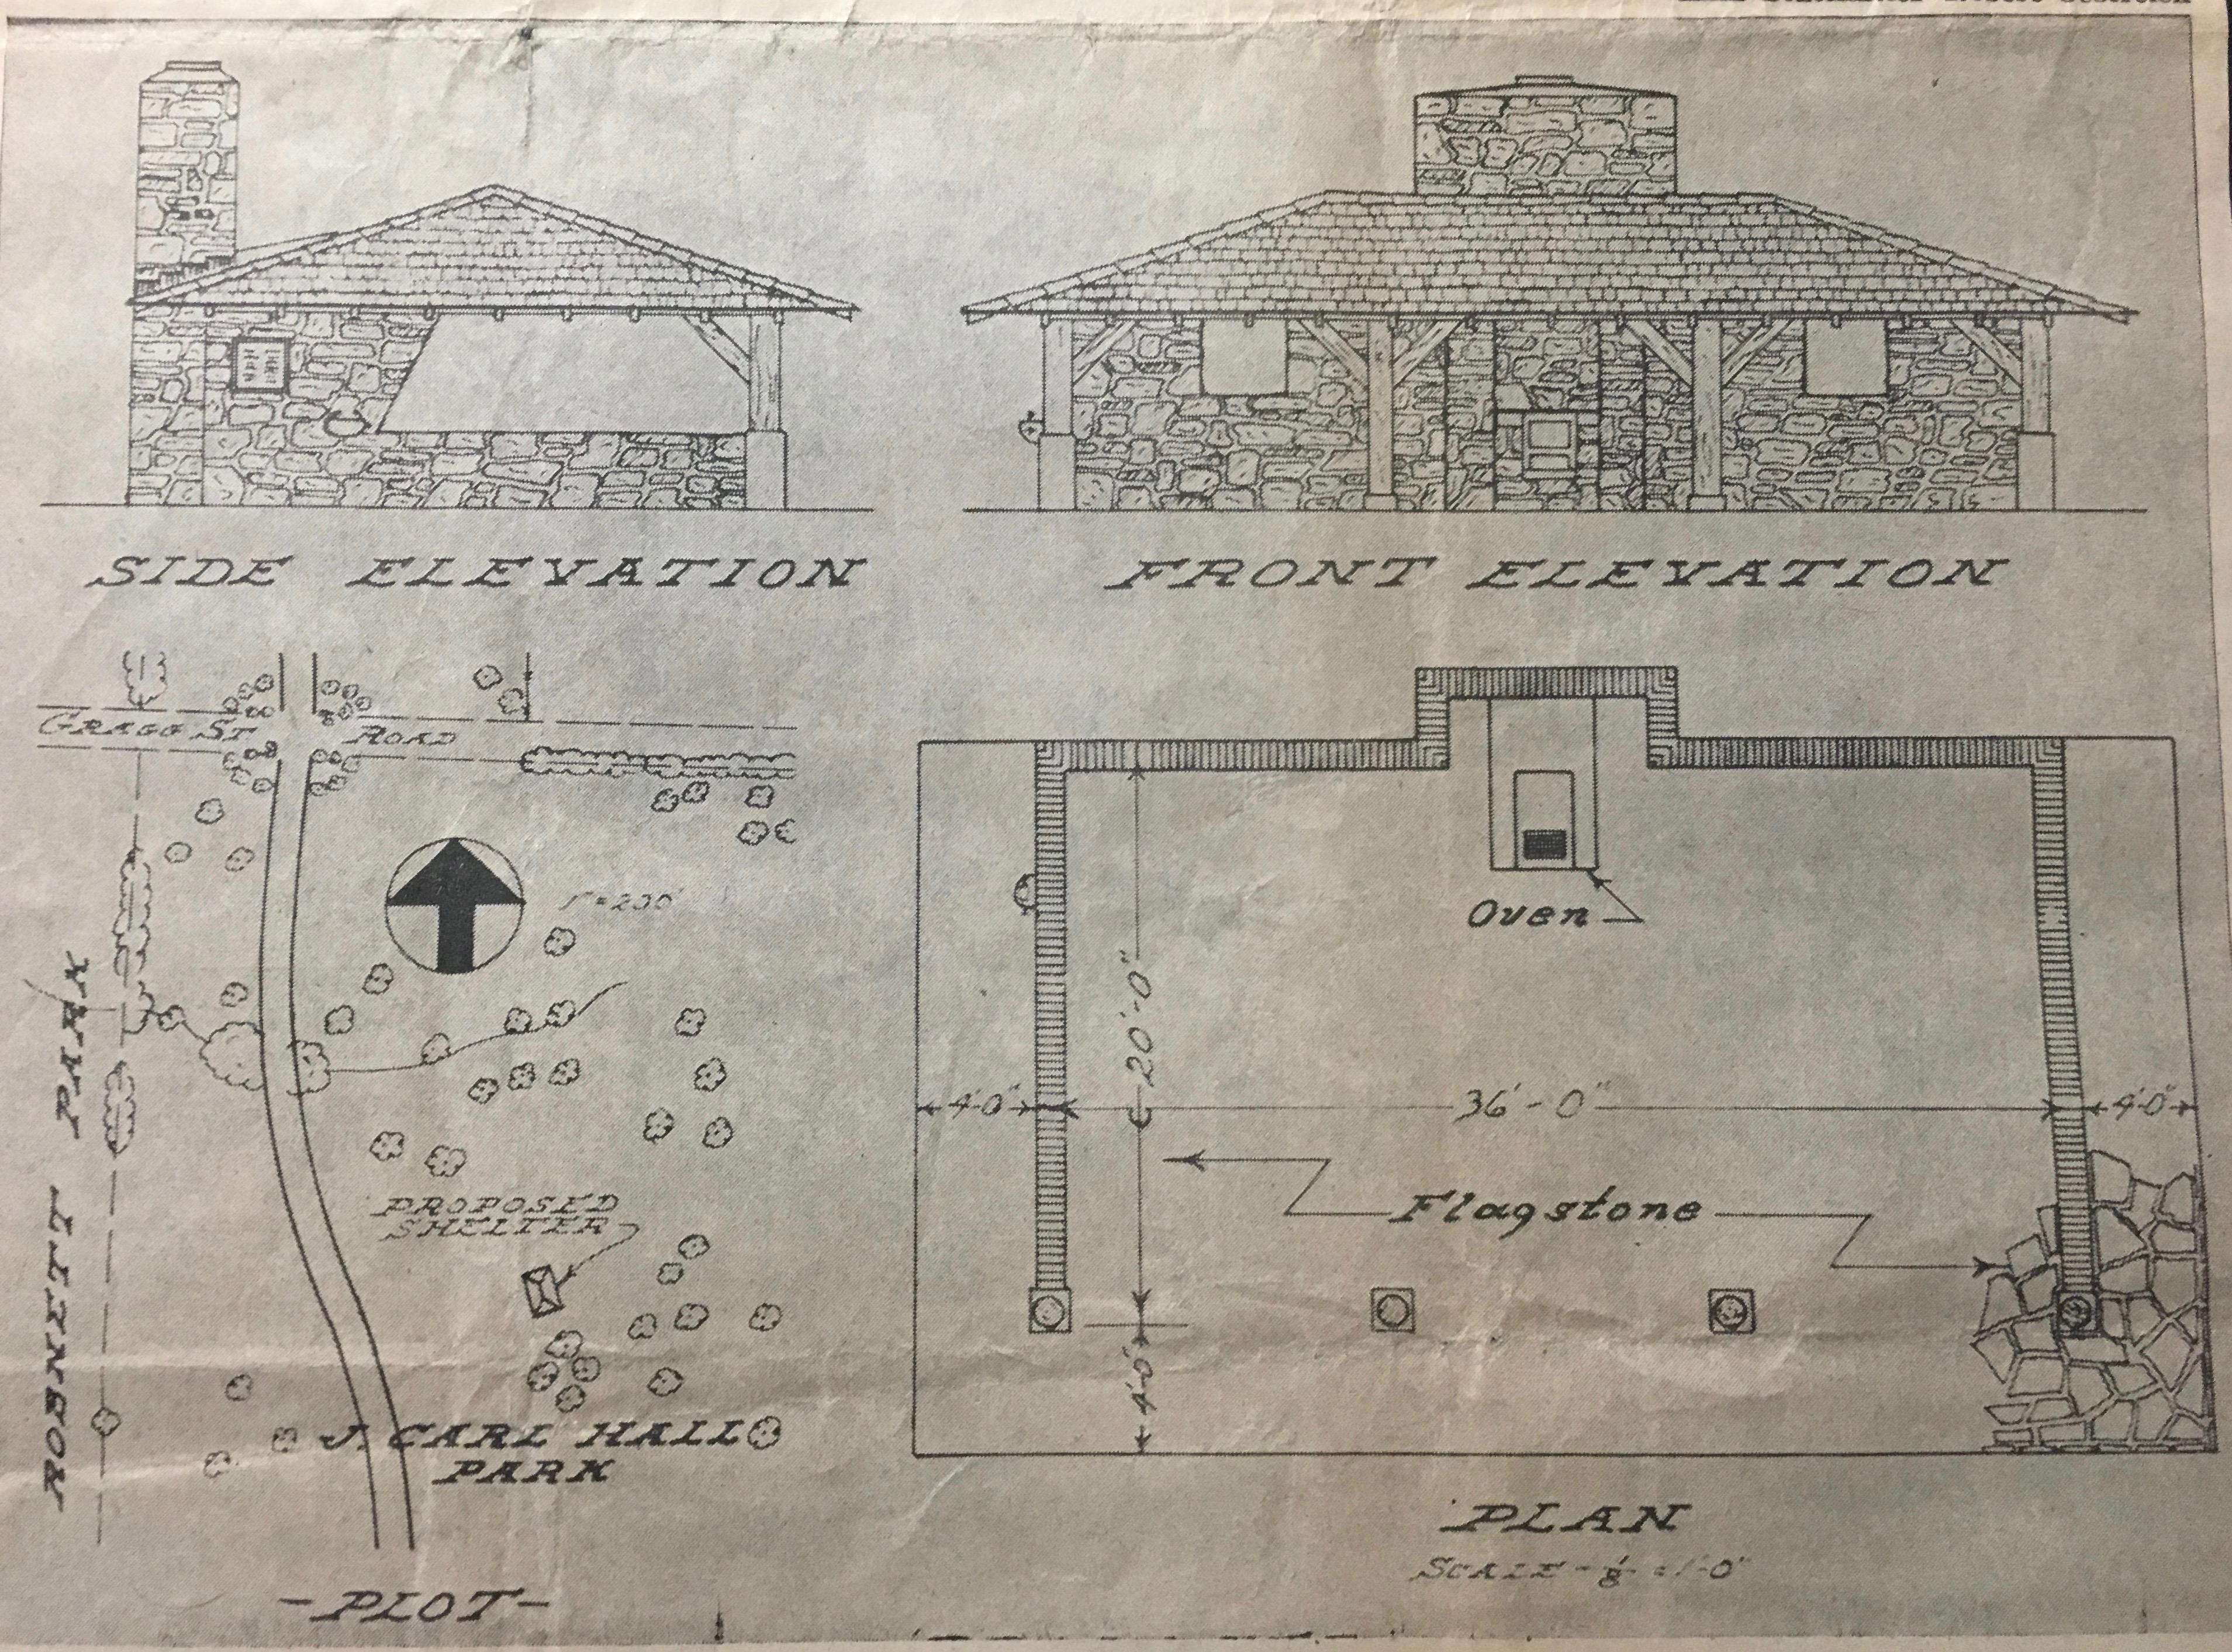 Miner's Memorial design